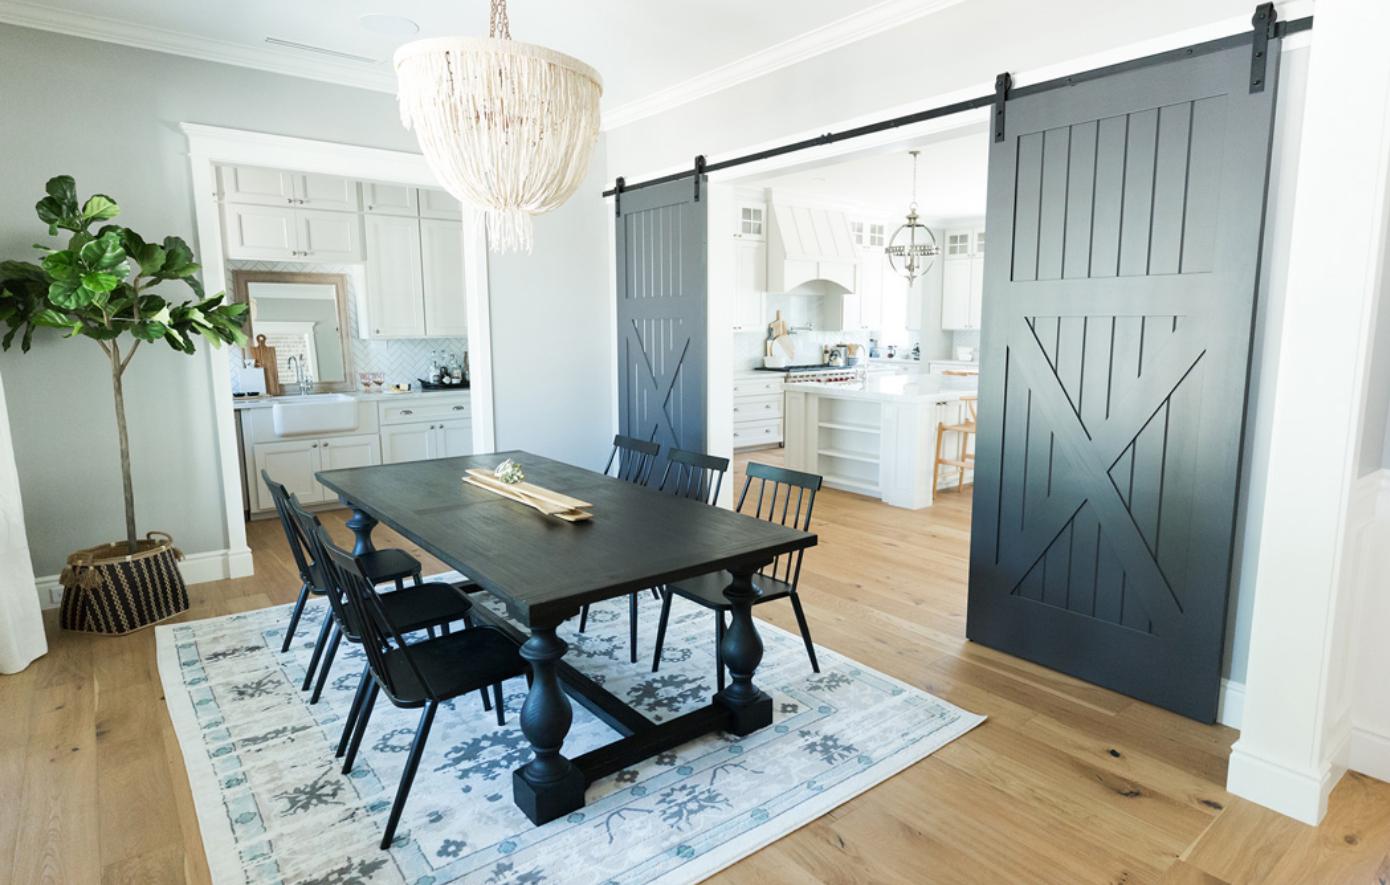 #CalleRosaProj Dining Room with Barn Doors